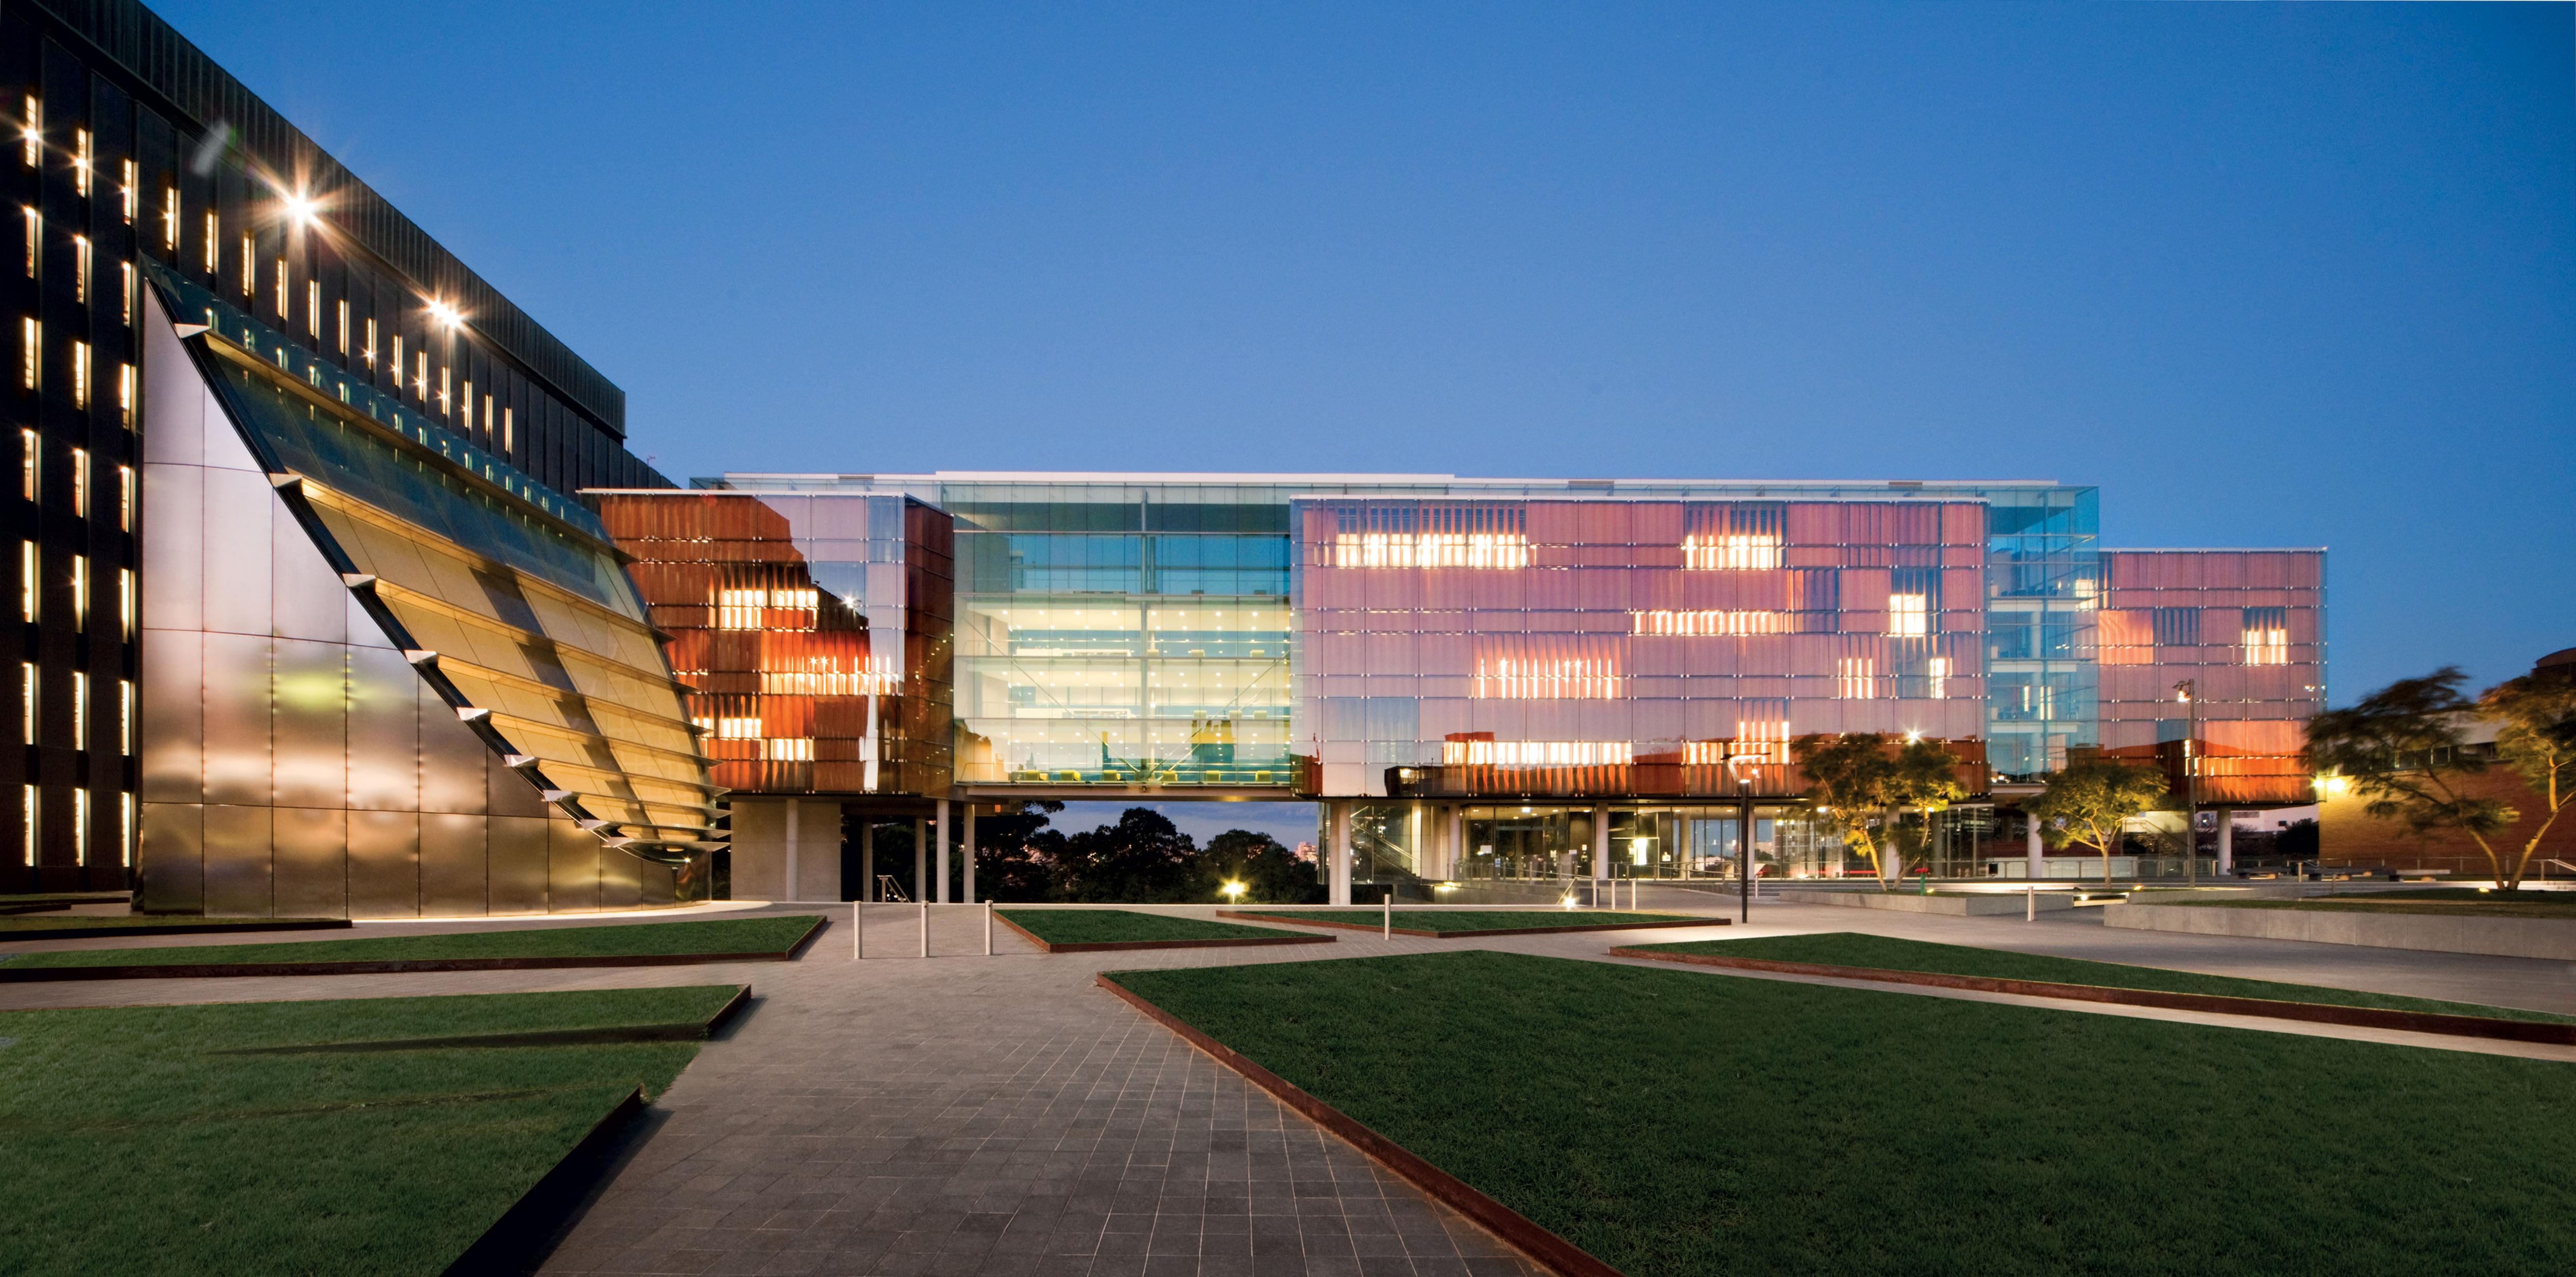 Law - The University of Sydney